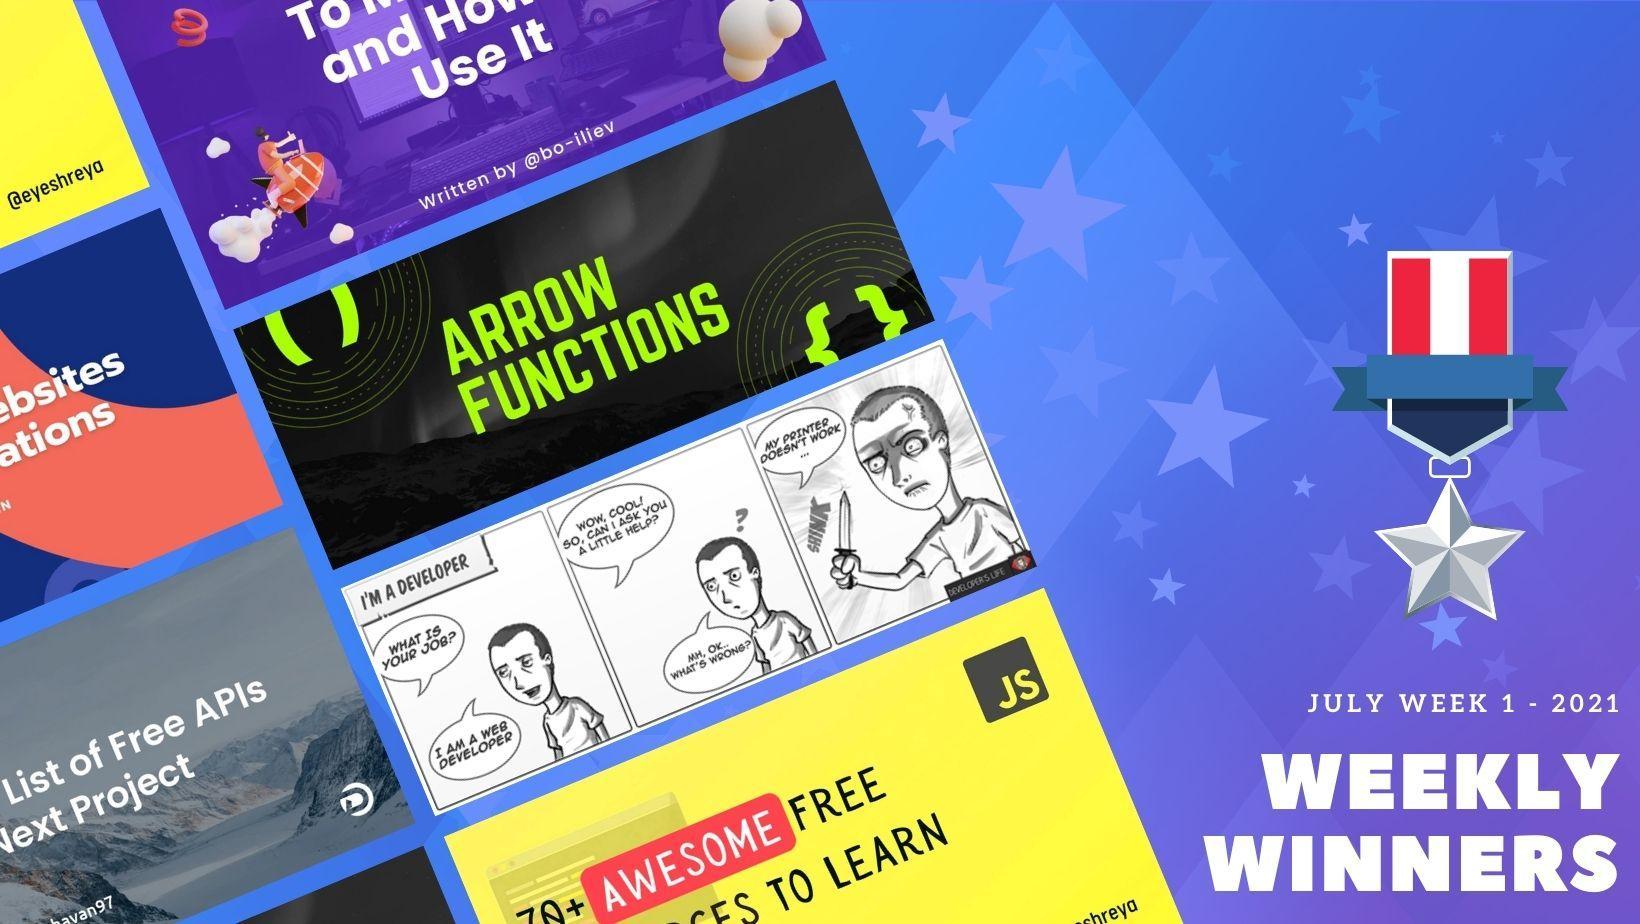 DevDojo Weekly Winners Week 1 July 2021